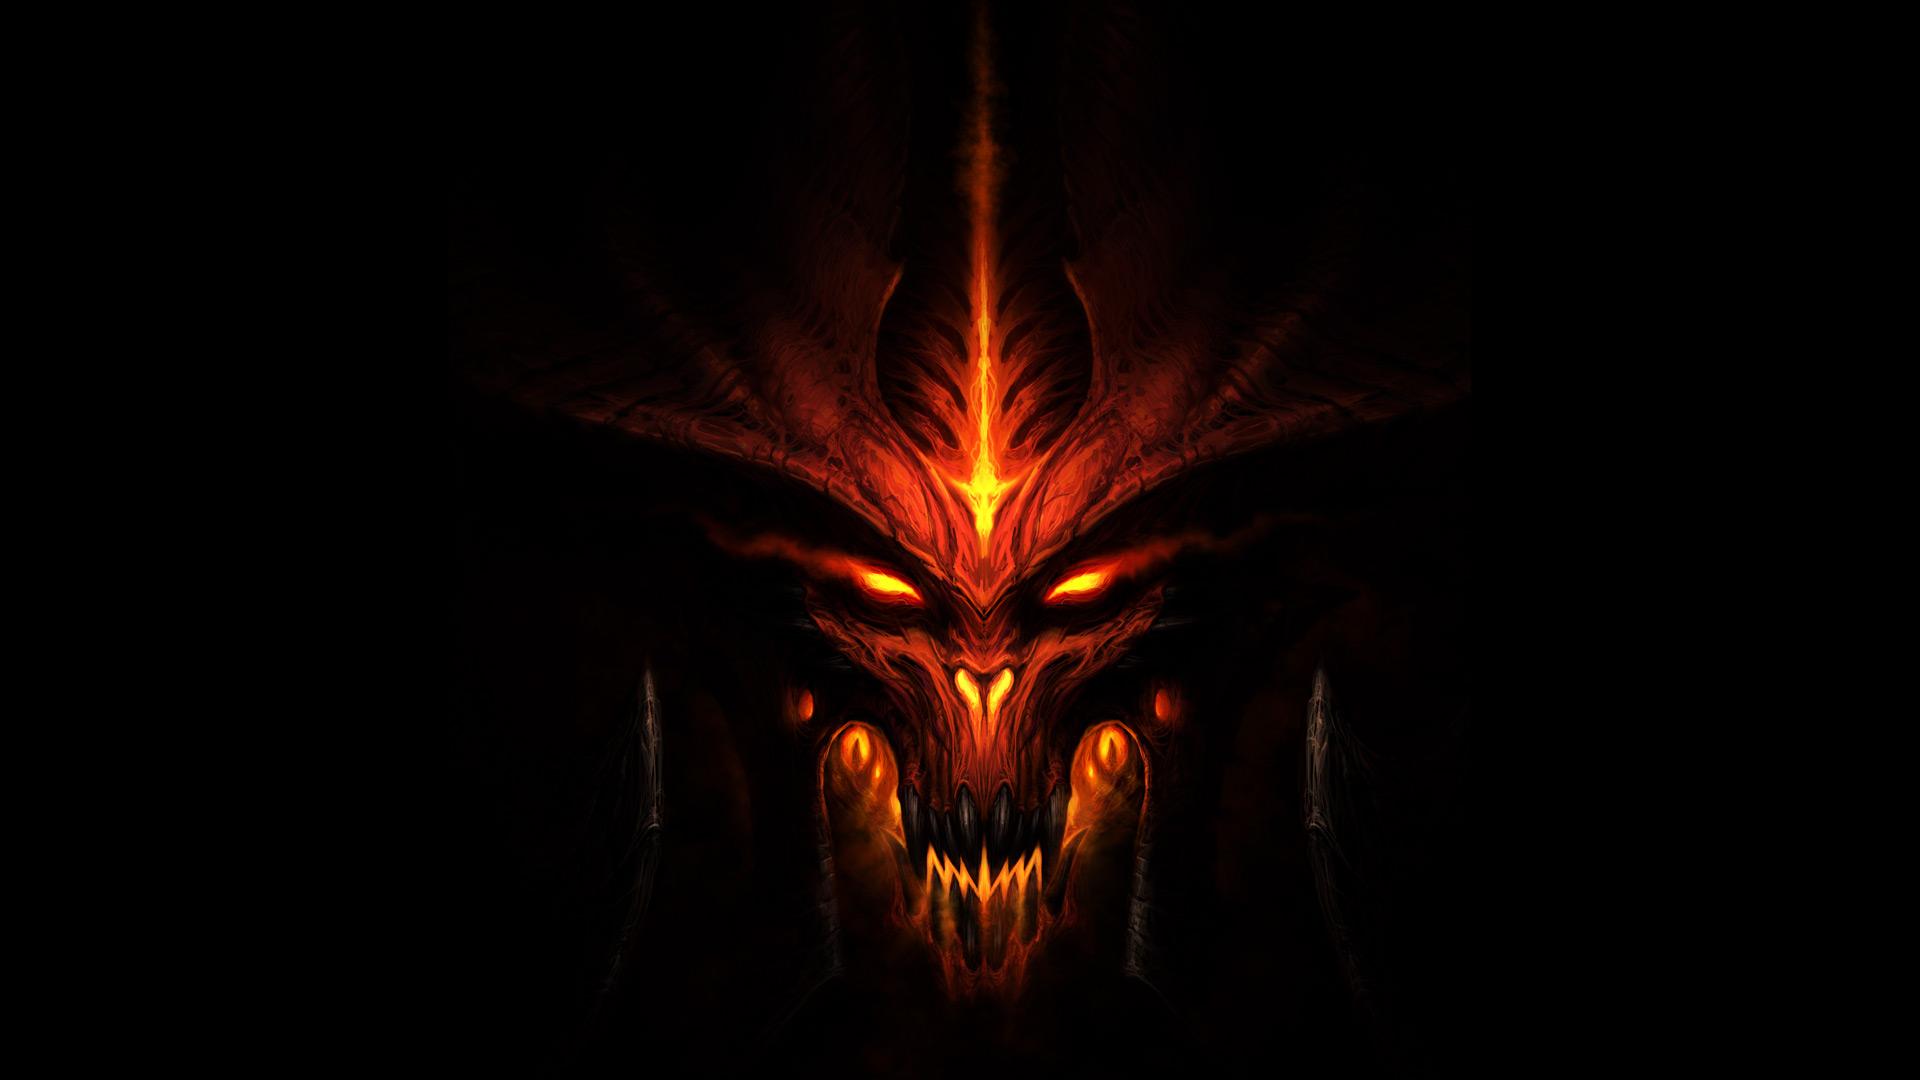 Diablo-3-wallpaper